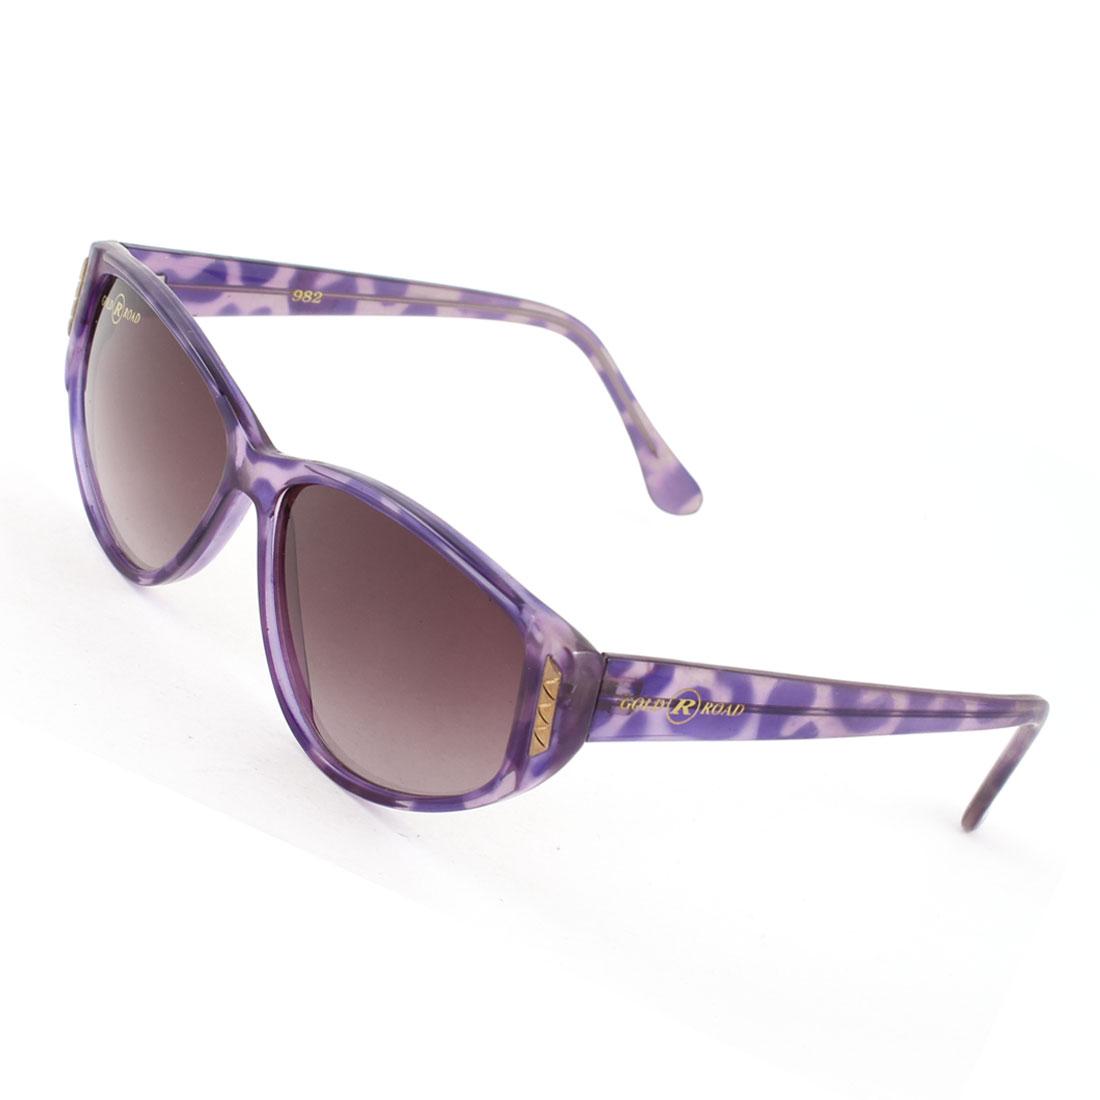 Lady Dark Burgundy Lenses Leopard Print Purple Full Rim One Bridge Sunglasses